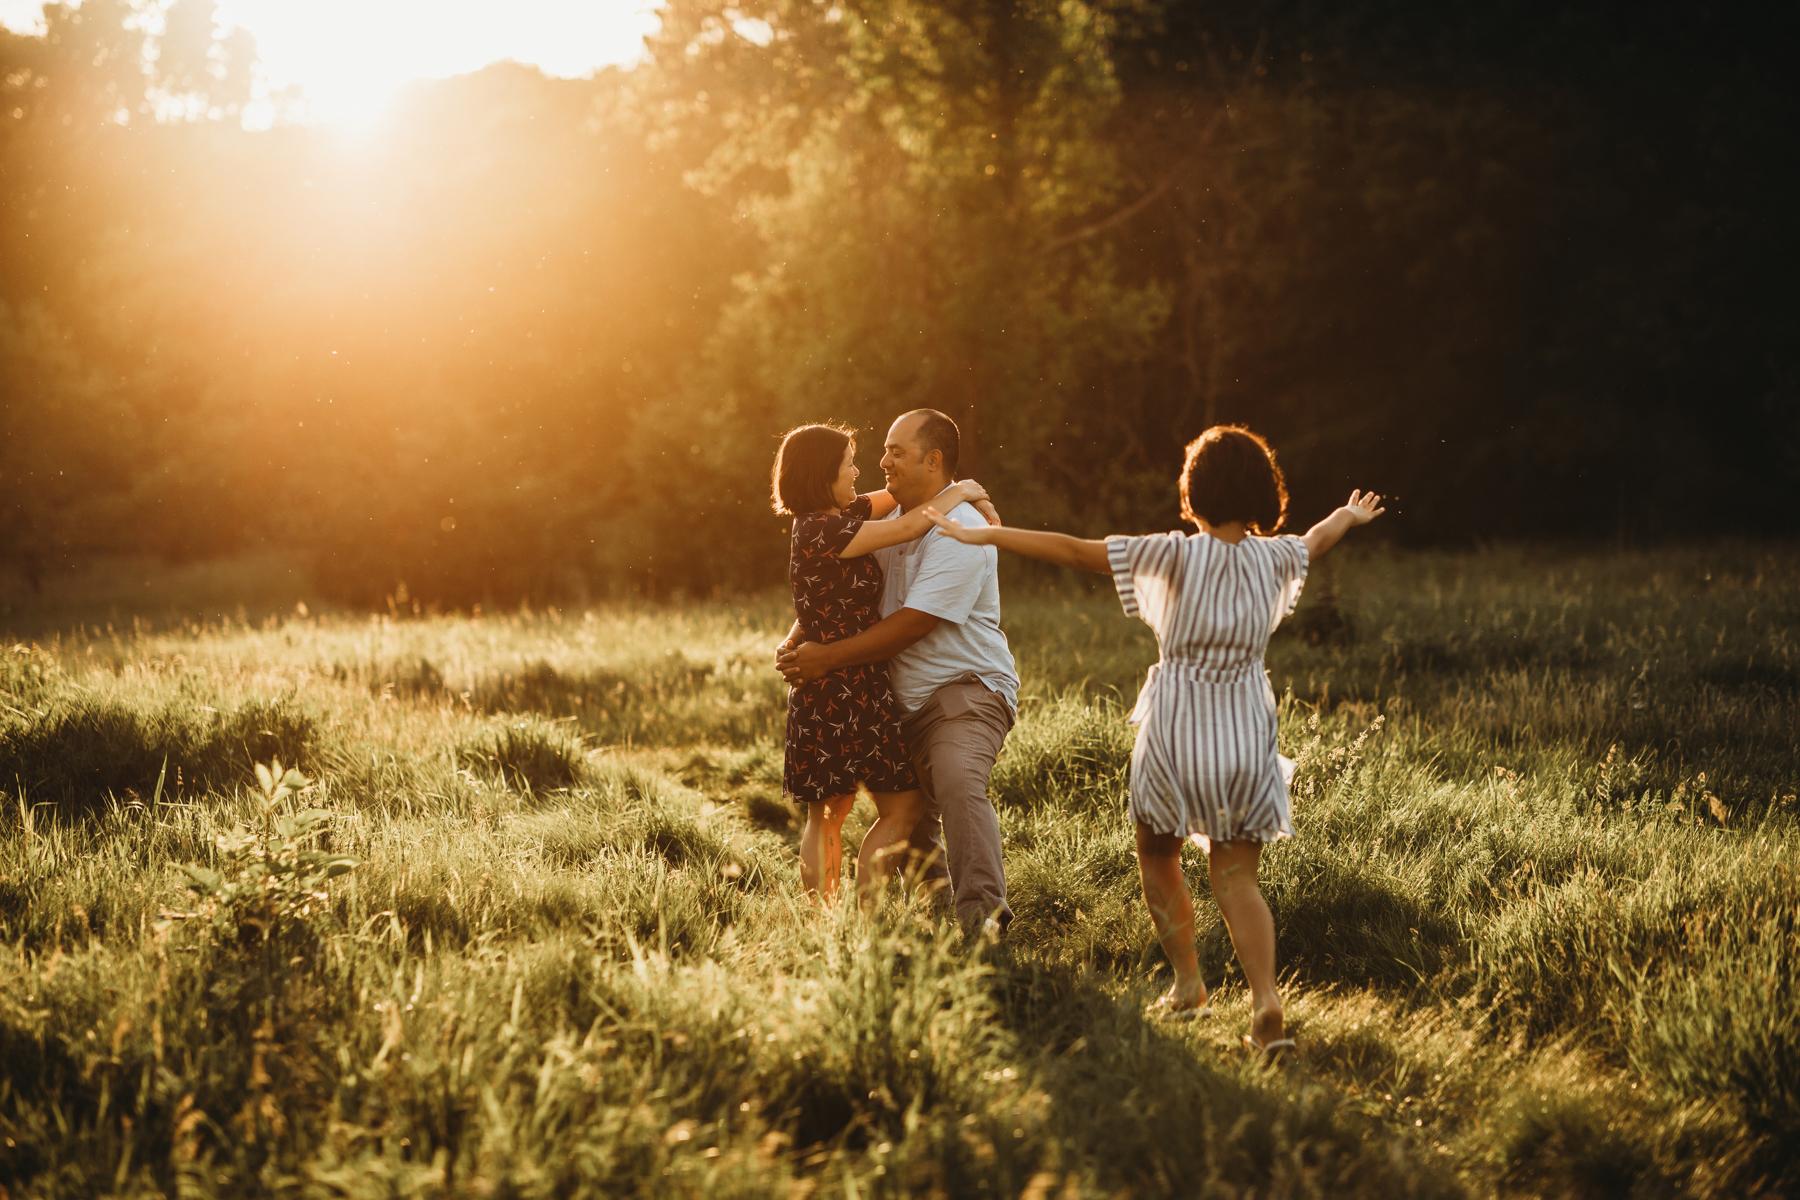 Golden hour family photography in Belmont, Massachusetts. Joy LeDuc Photography.